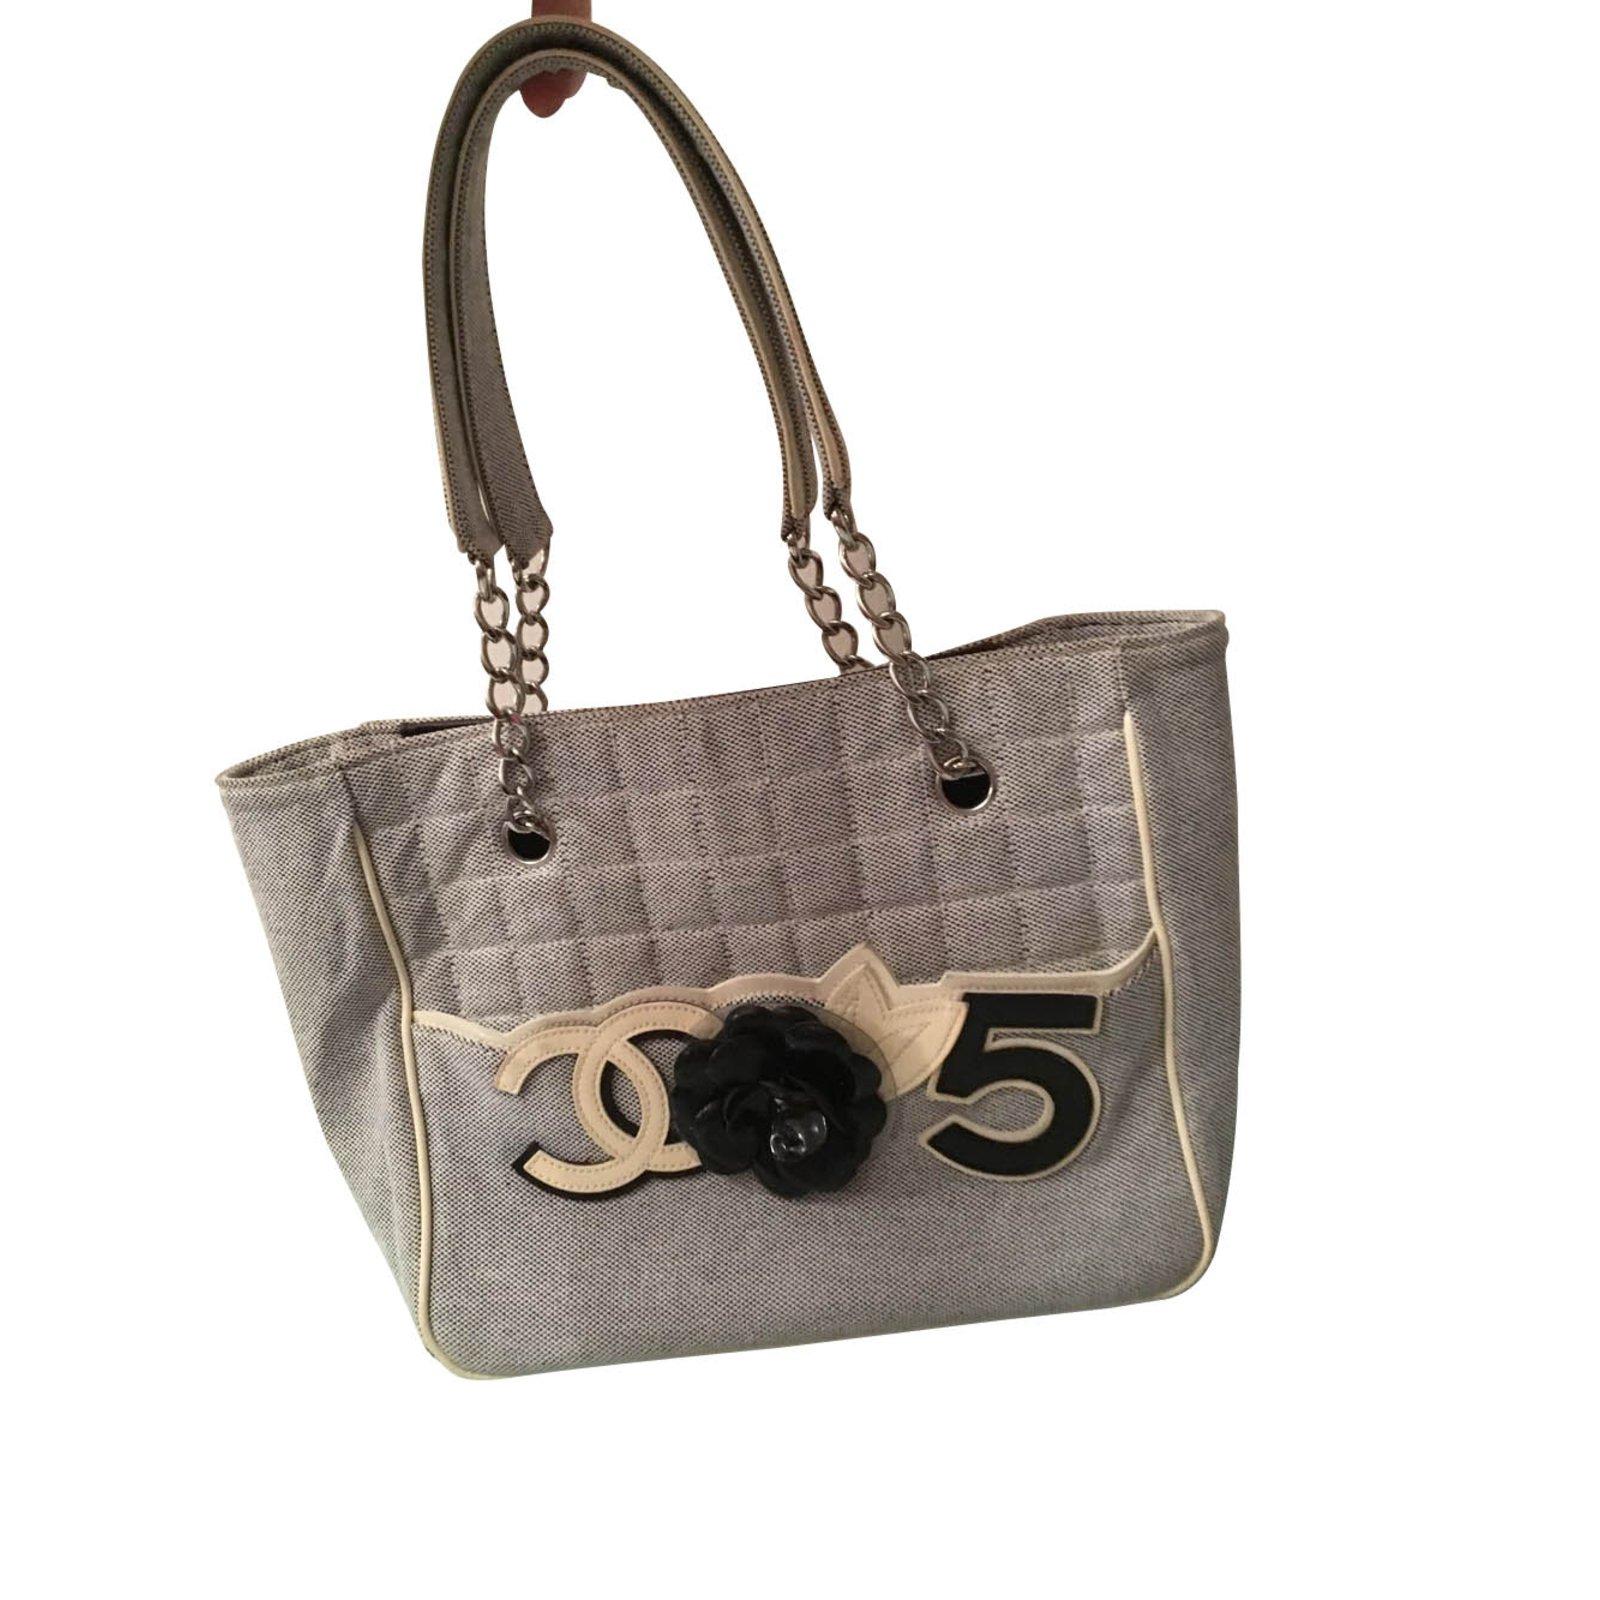 bb23e4a3c72e Chanel Handbags Handbags Cloth Multiple colors ref.99371 - Joli Closet